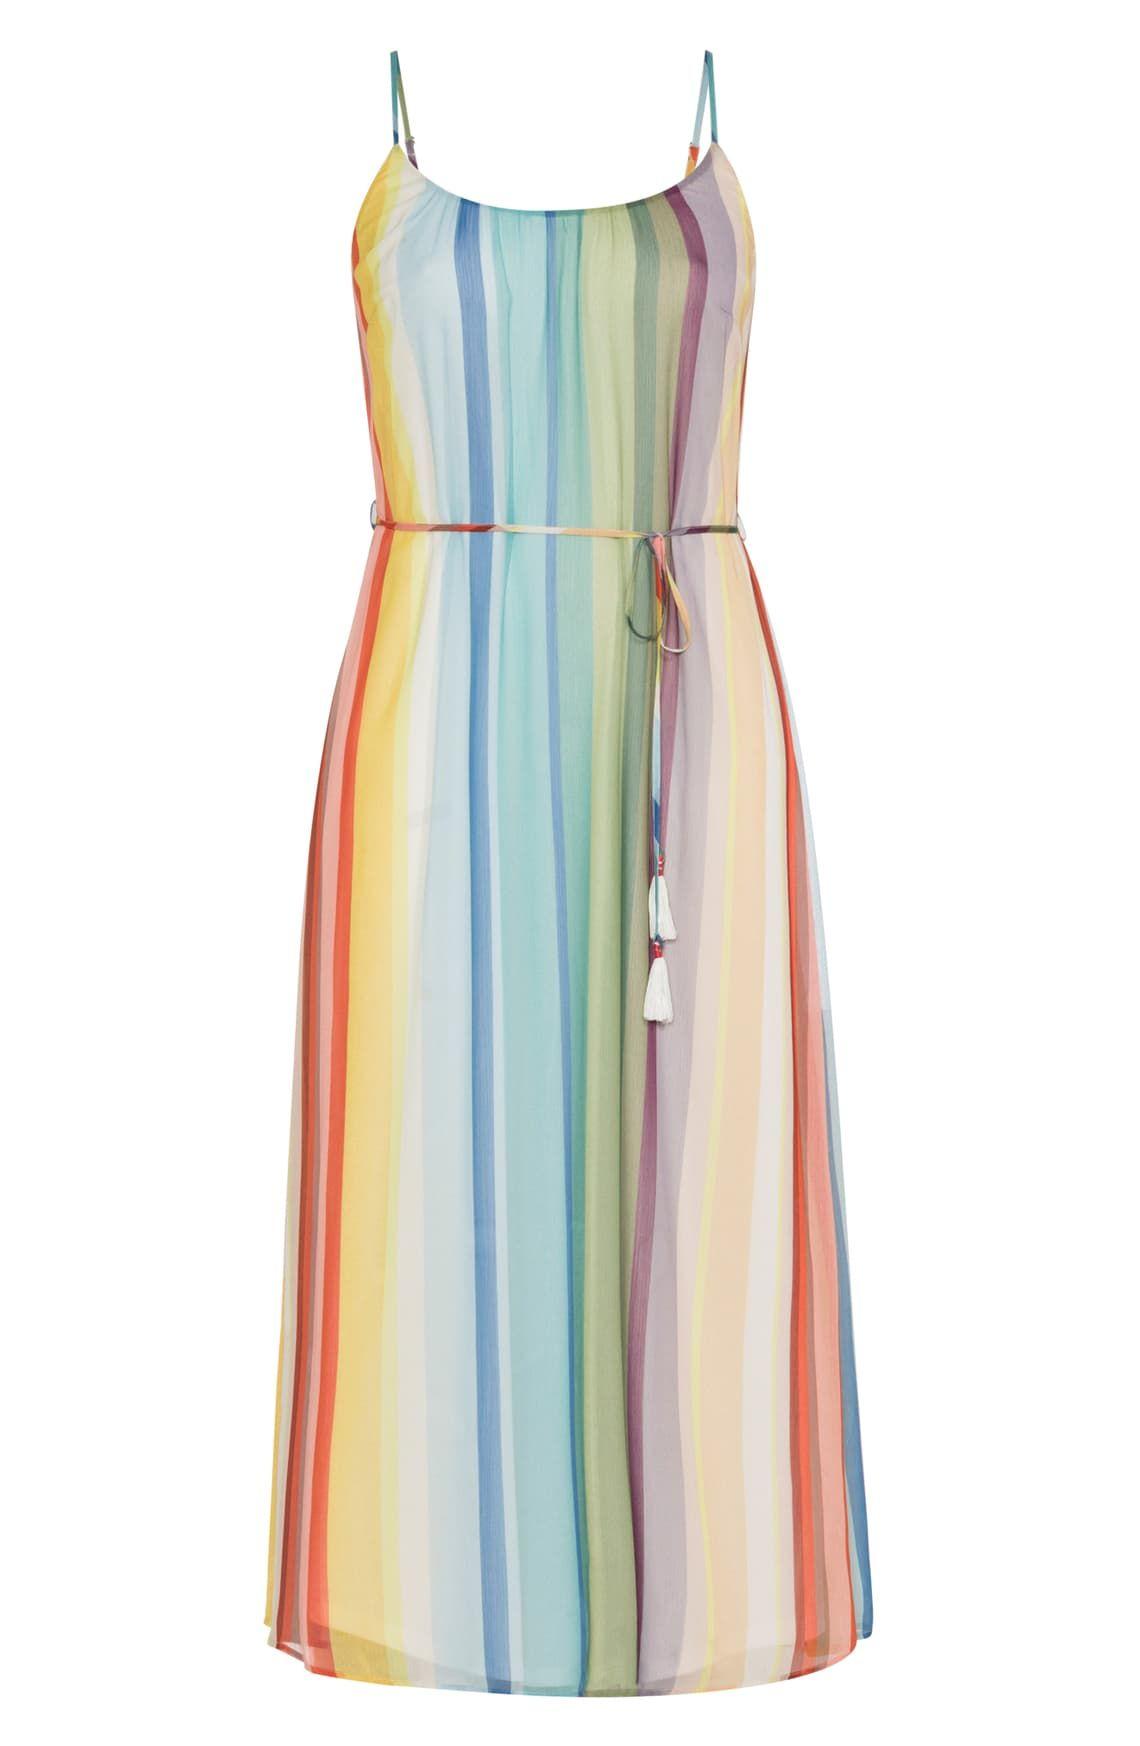 City chic gelato stripe maxi dress plus size nordstrom